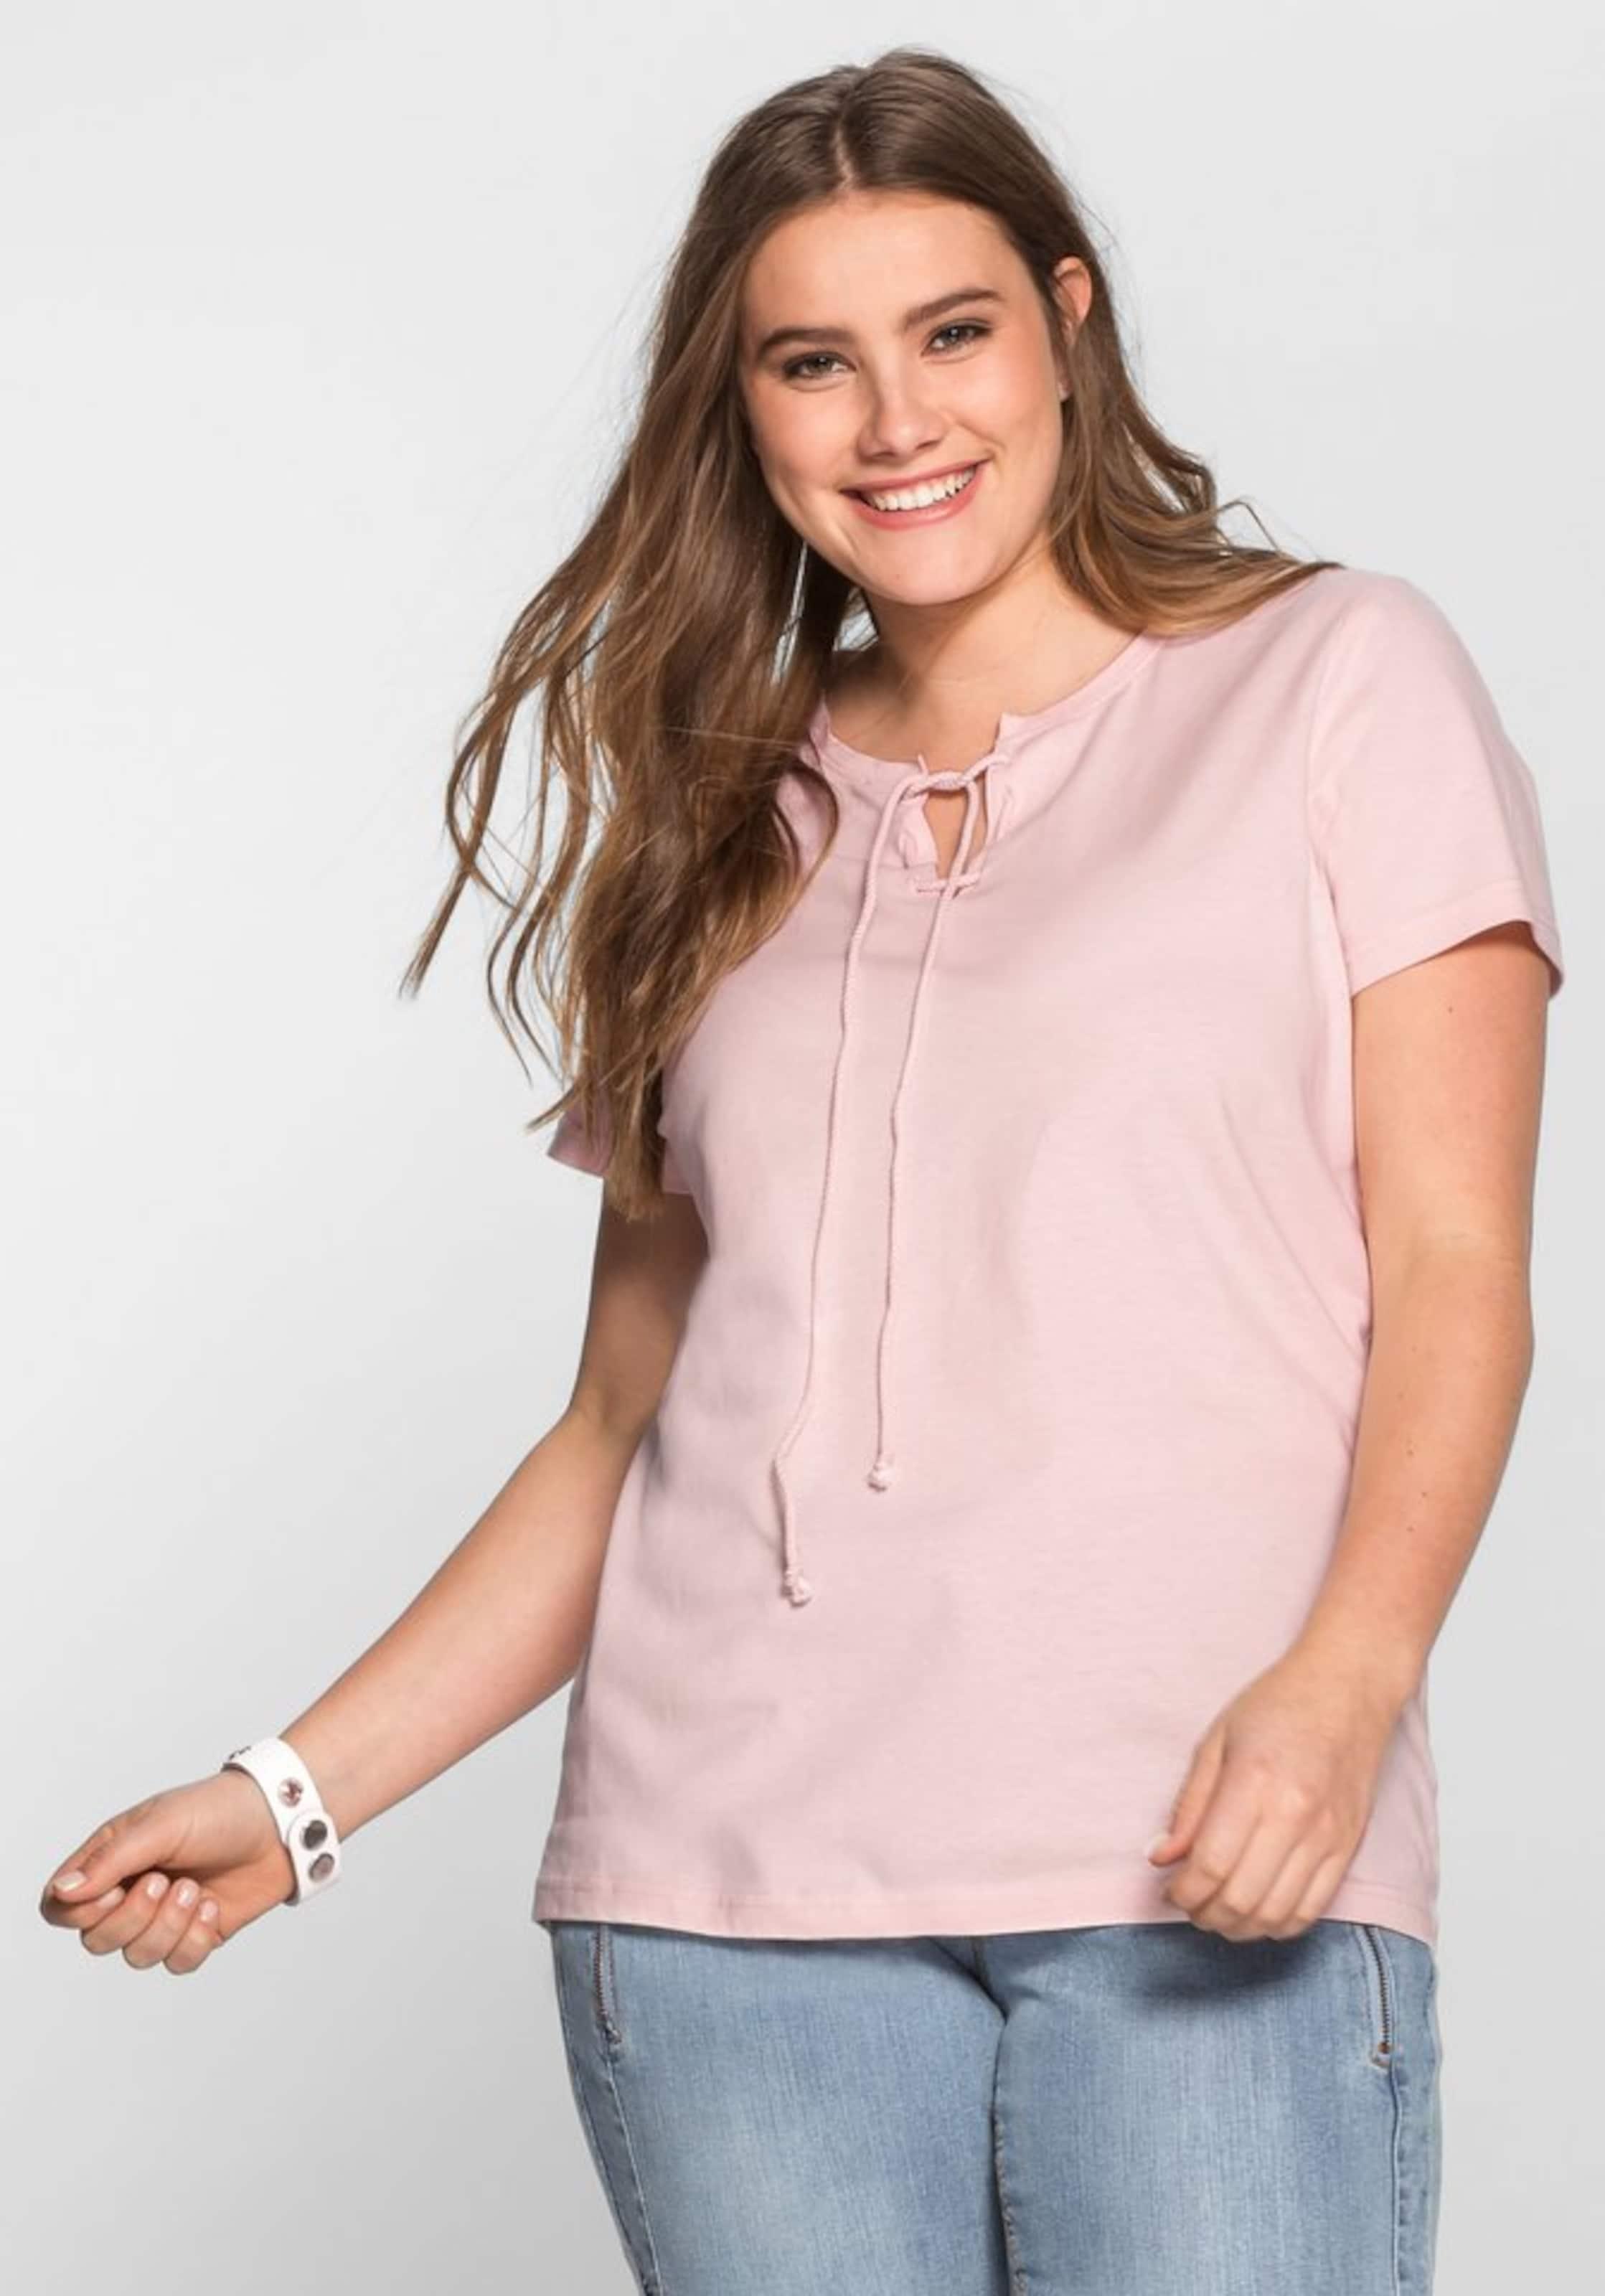 Sheego Sheego T Sheego In Rosa In T shirt In Rosa T shirt shirt 8wPOkn0